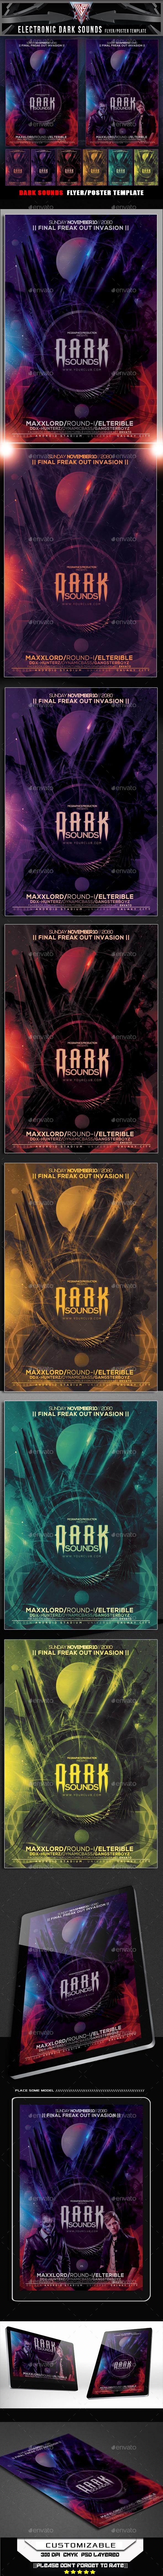 Dark Sounds Flyer Template - Flyers Print Templates